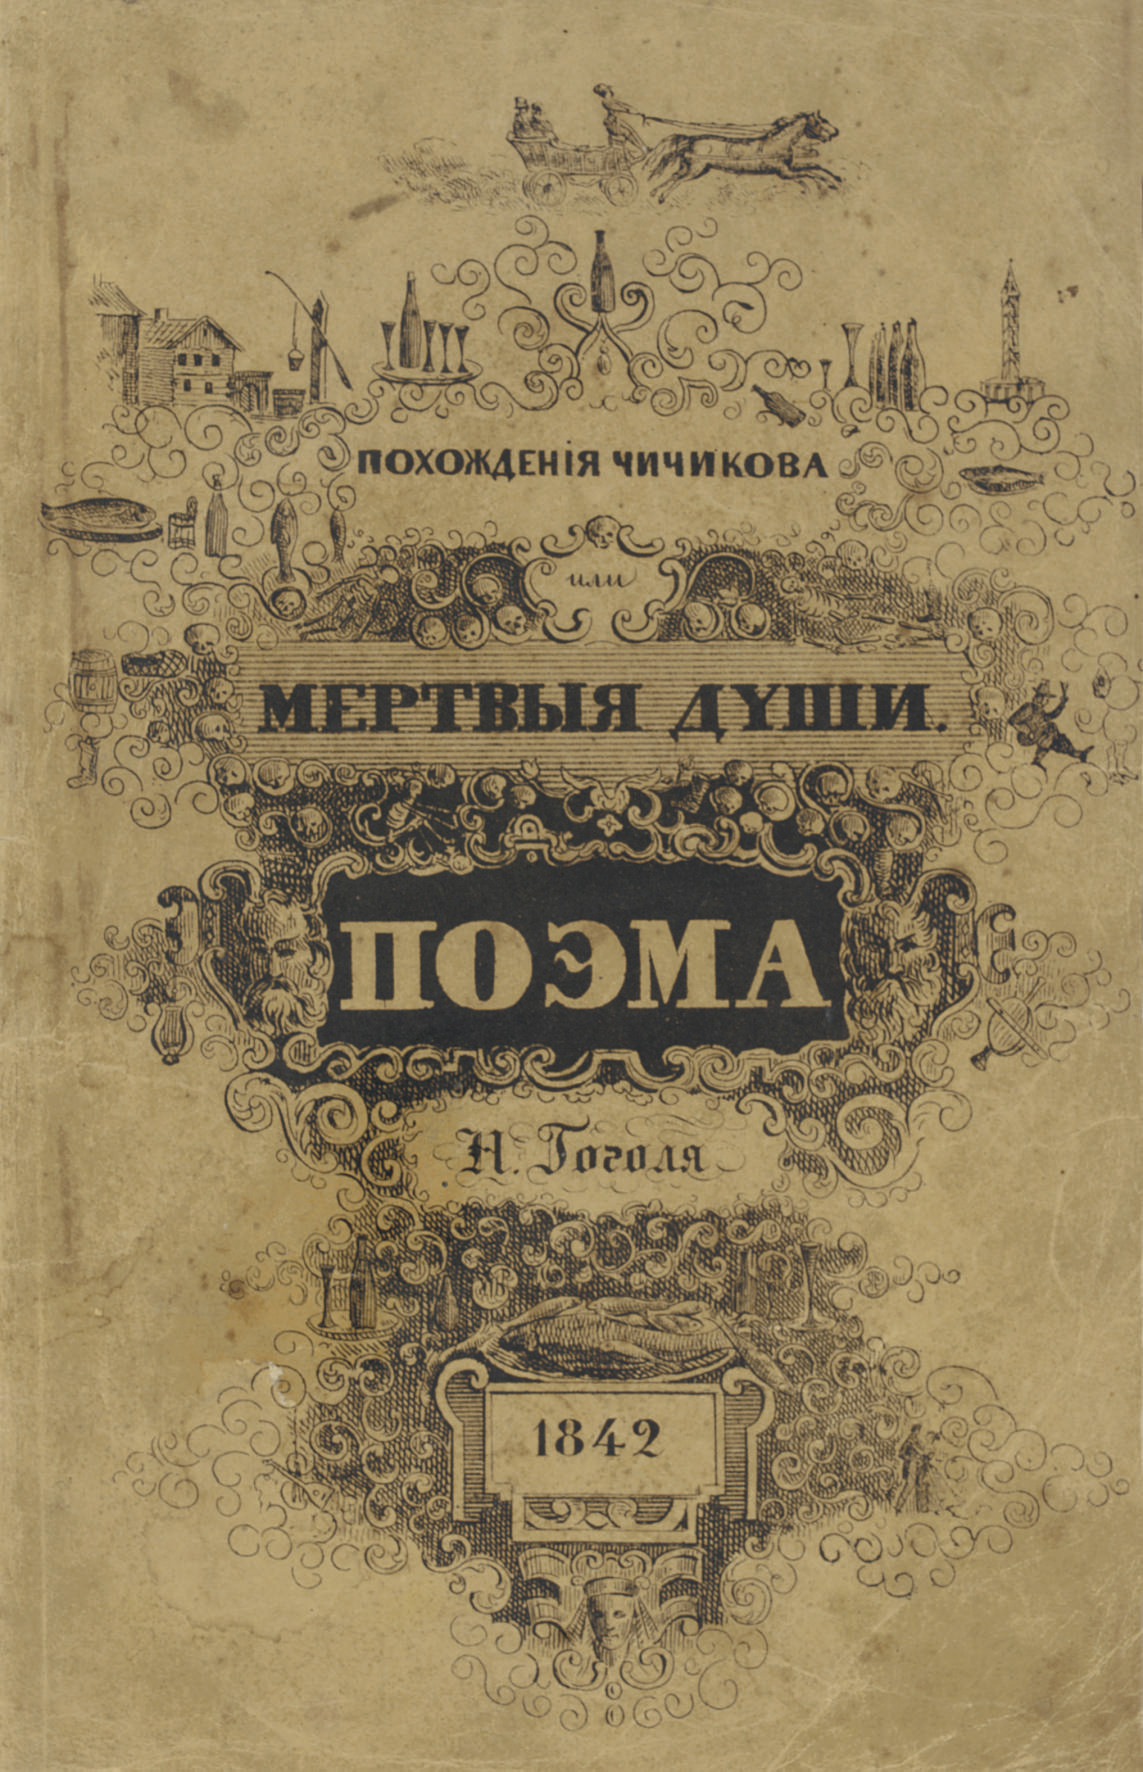 GOGOL, Nikolai Vasil'evich (1809-1852). Pokhozhdeniia Chichikhova, ili Mertvyia Dushi. T. 1-2. [The Adventures of Chichikhov, or Dead Souls. Vols. 1-2.] Moscow: at the University Press, 1842-1855.